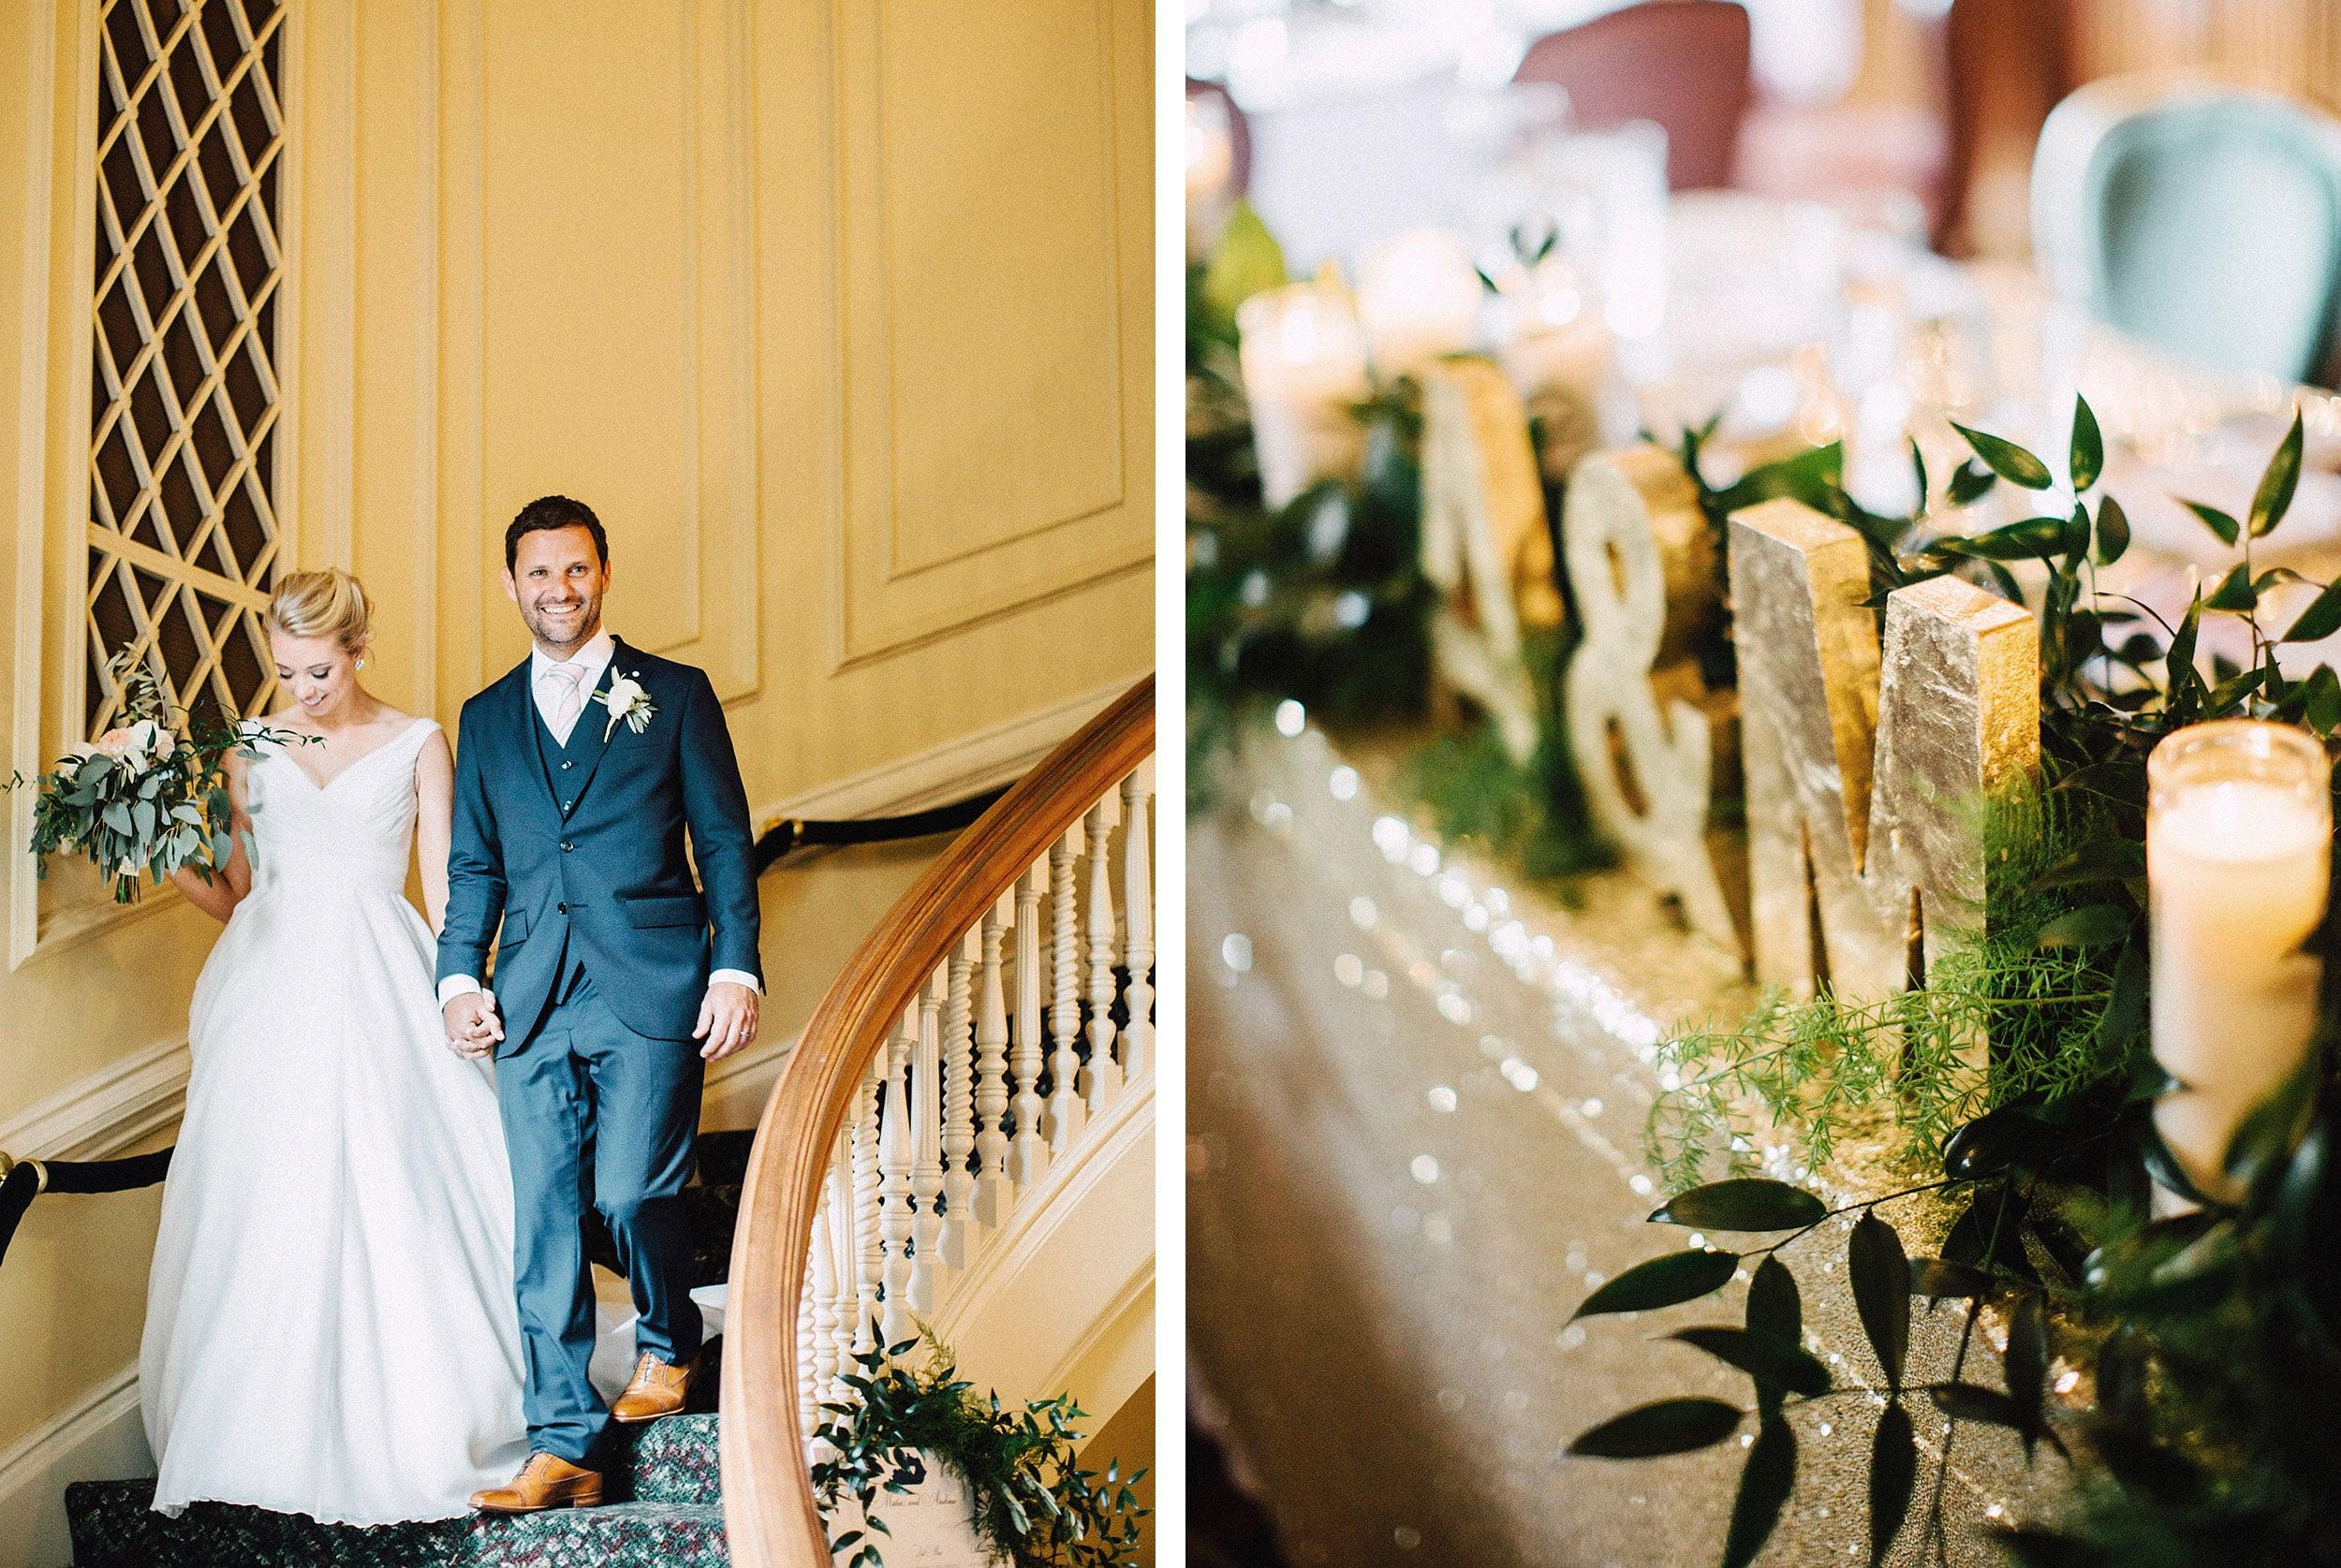 spindletop-lexington-wedding-photographer-032.JPG